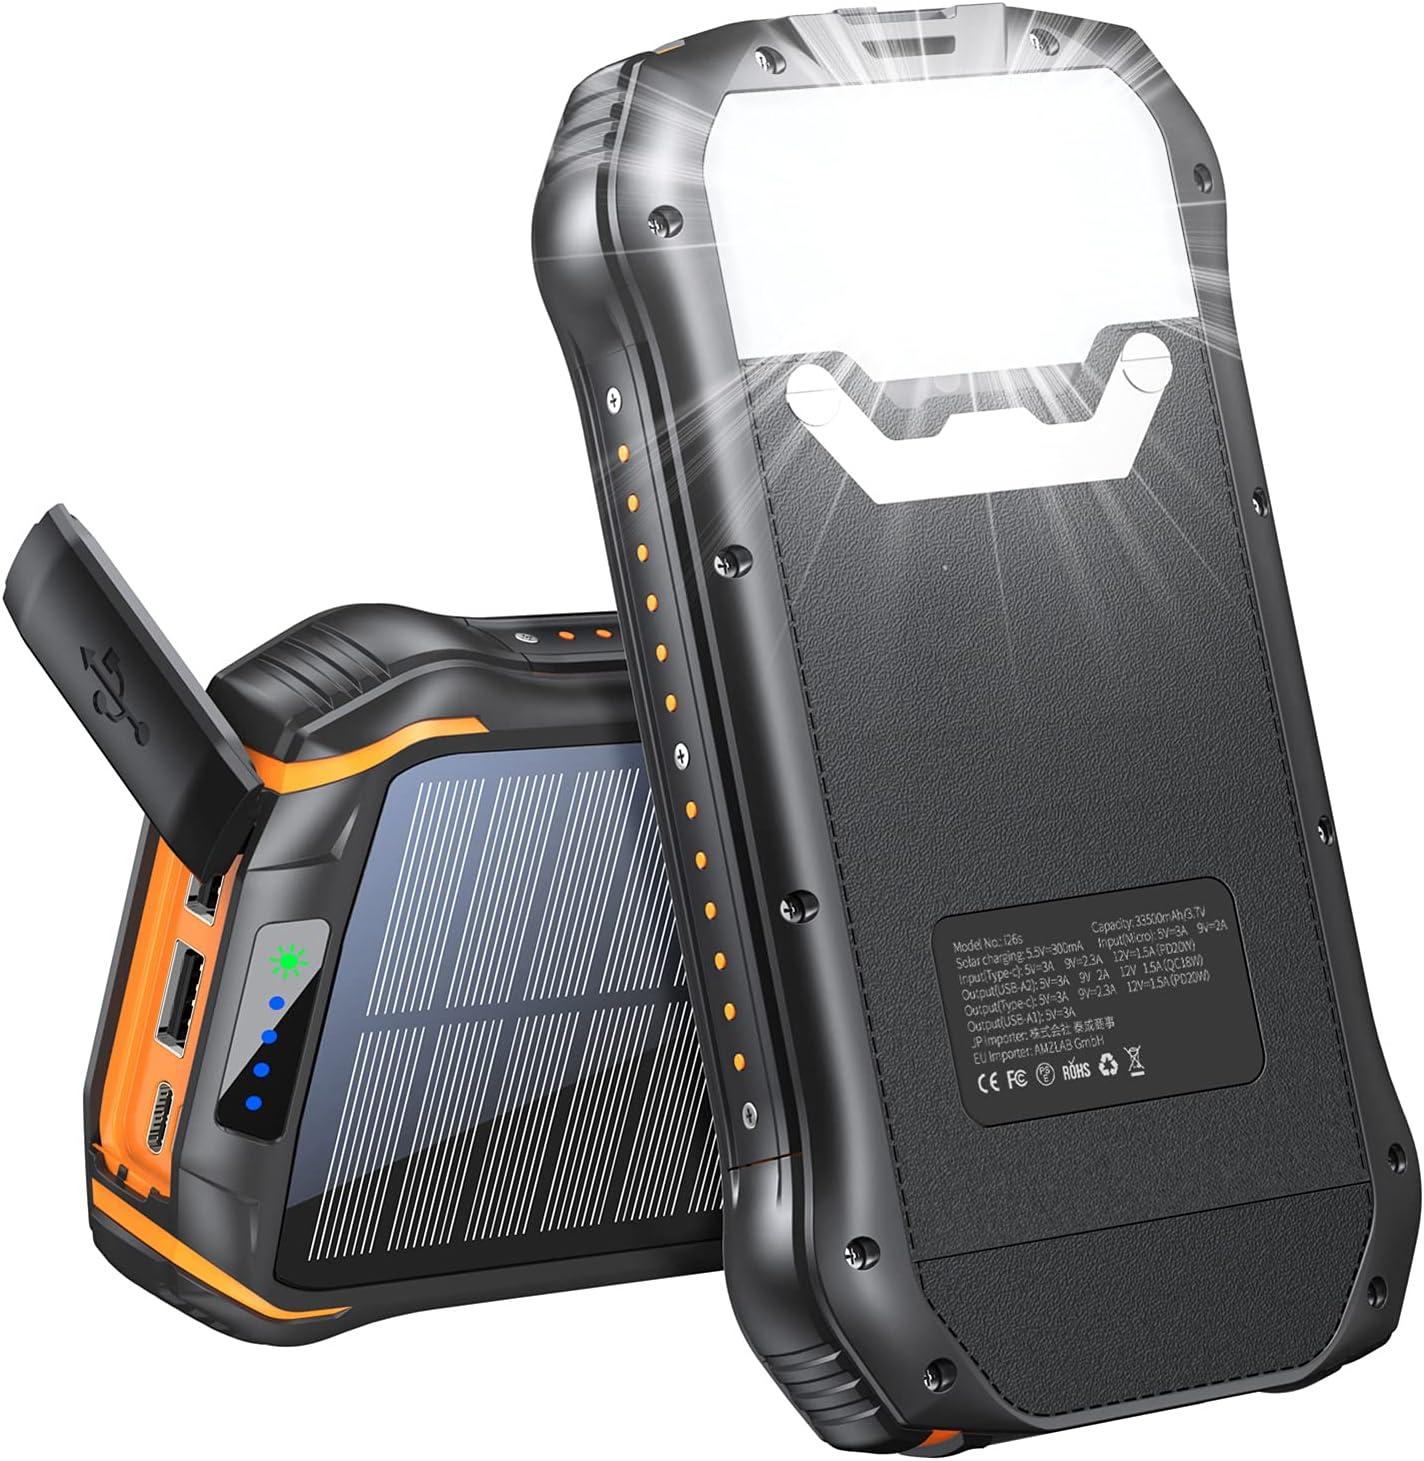 Solar Charger 33500mAh, Portable Power Bank,PD 20W QC Black + orange